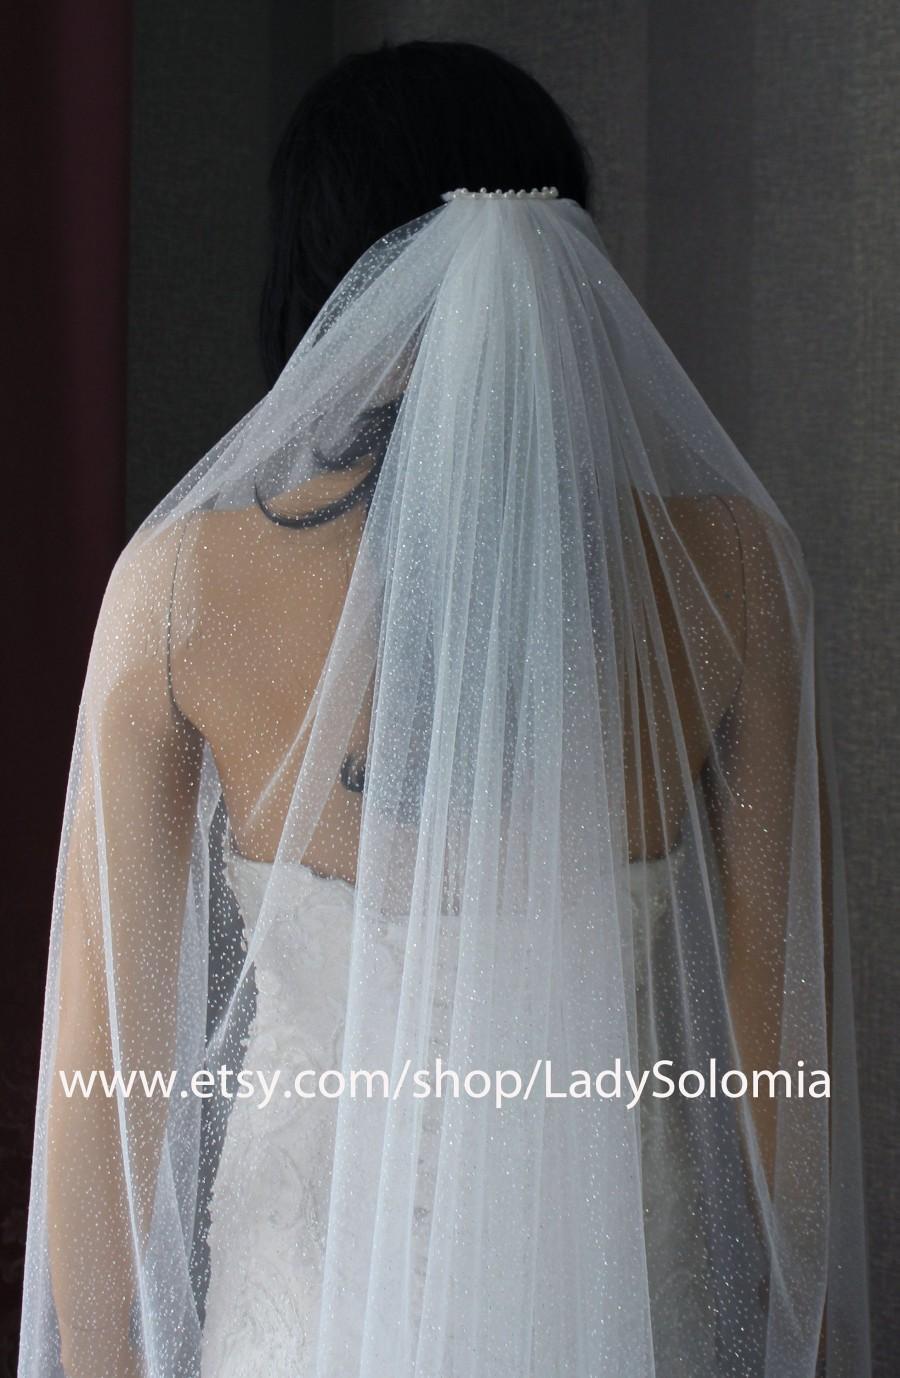 Wedding - Glitter wedding veil, Glitter Bridal Veil, Sparkle Veil, Tulle with glitter One tier veil, Raw Cut Edge veil, Cathedral long sparkling veil